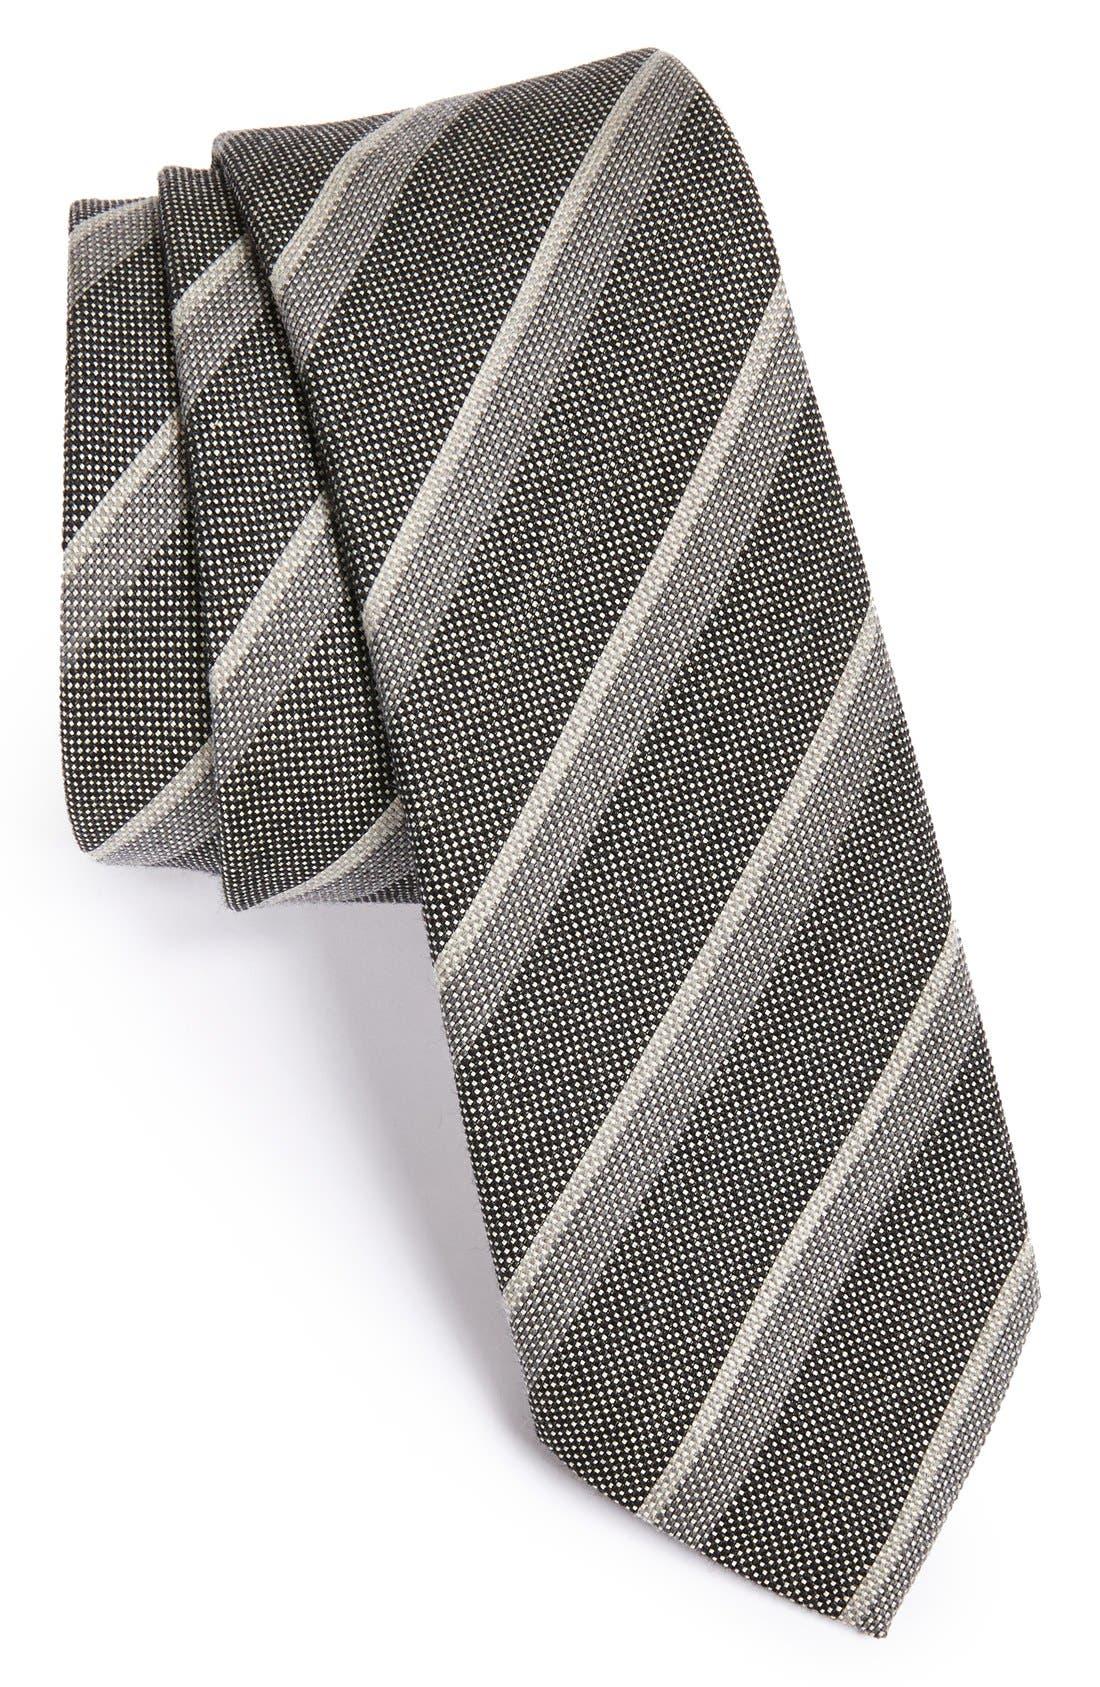 Main Image - John Varvatos Collection Woven Cotton Blend Tie